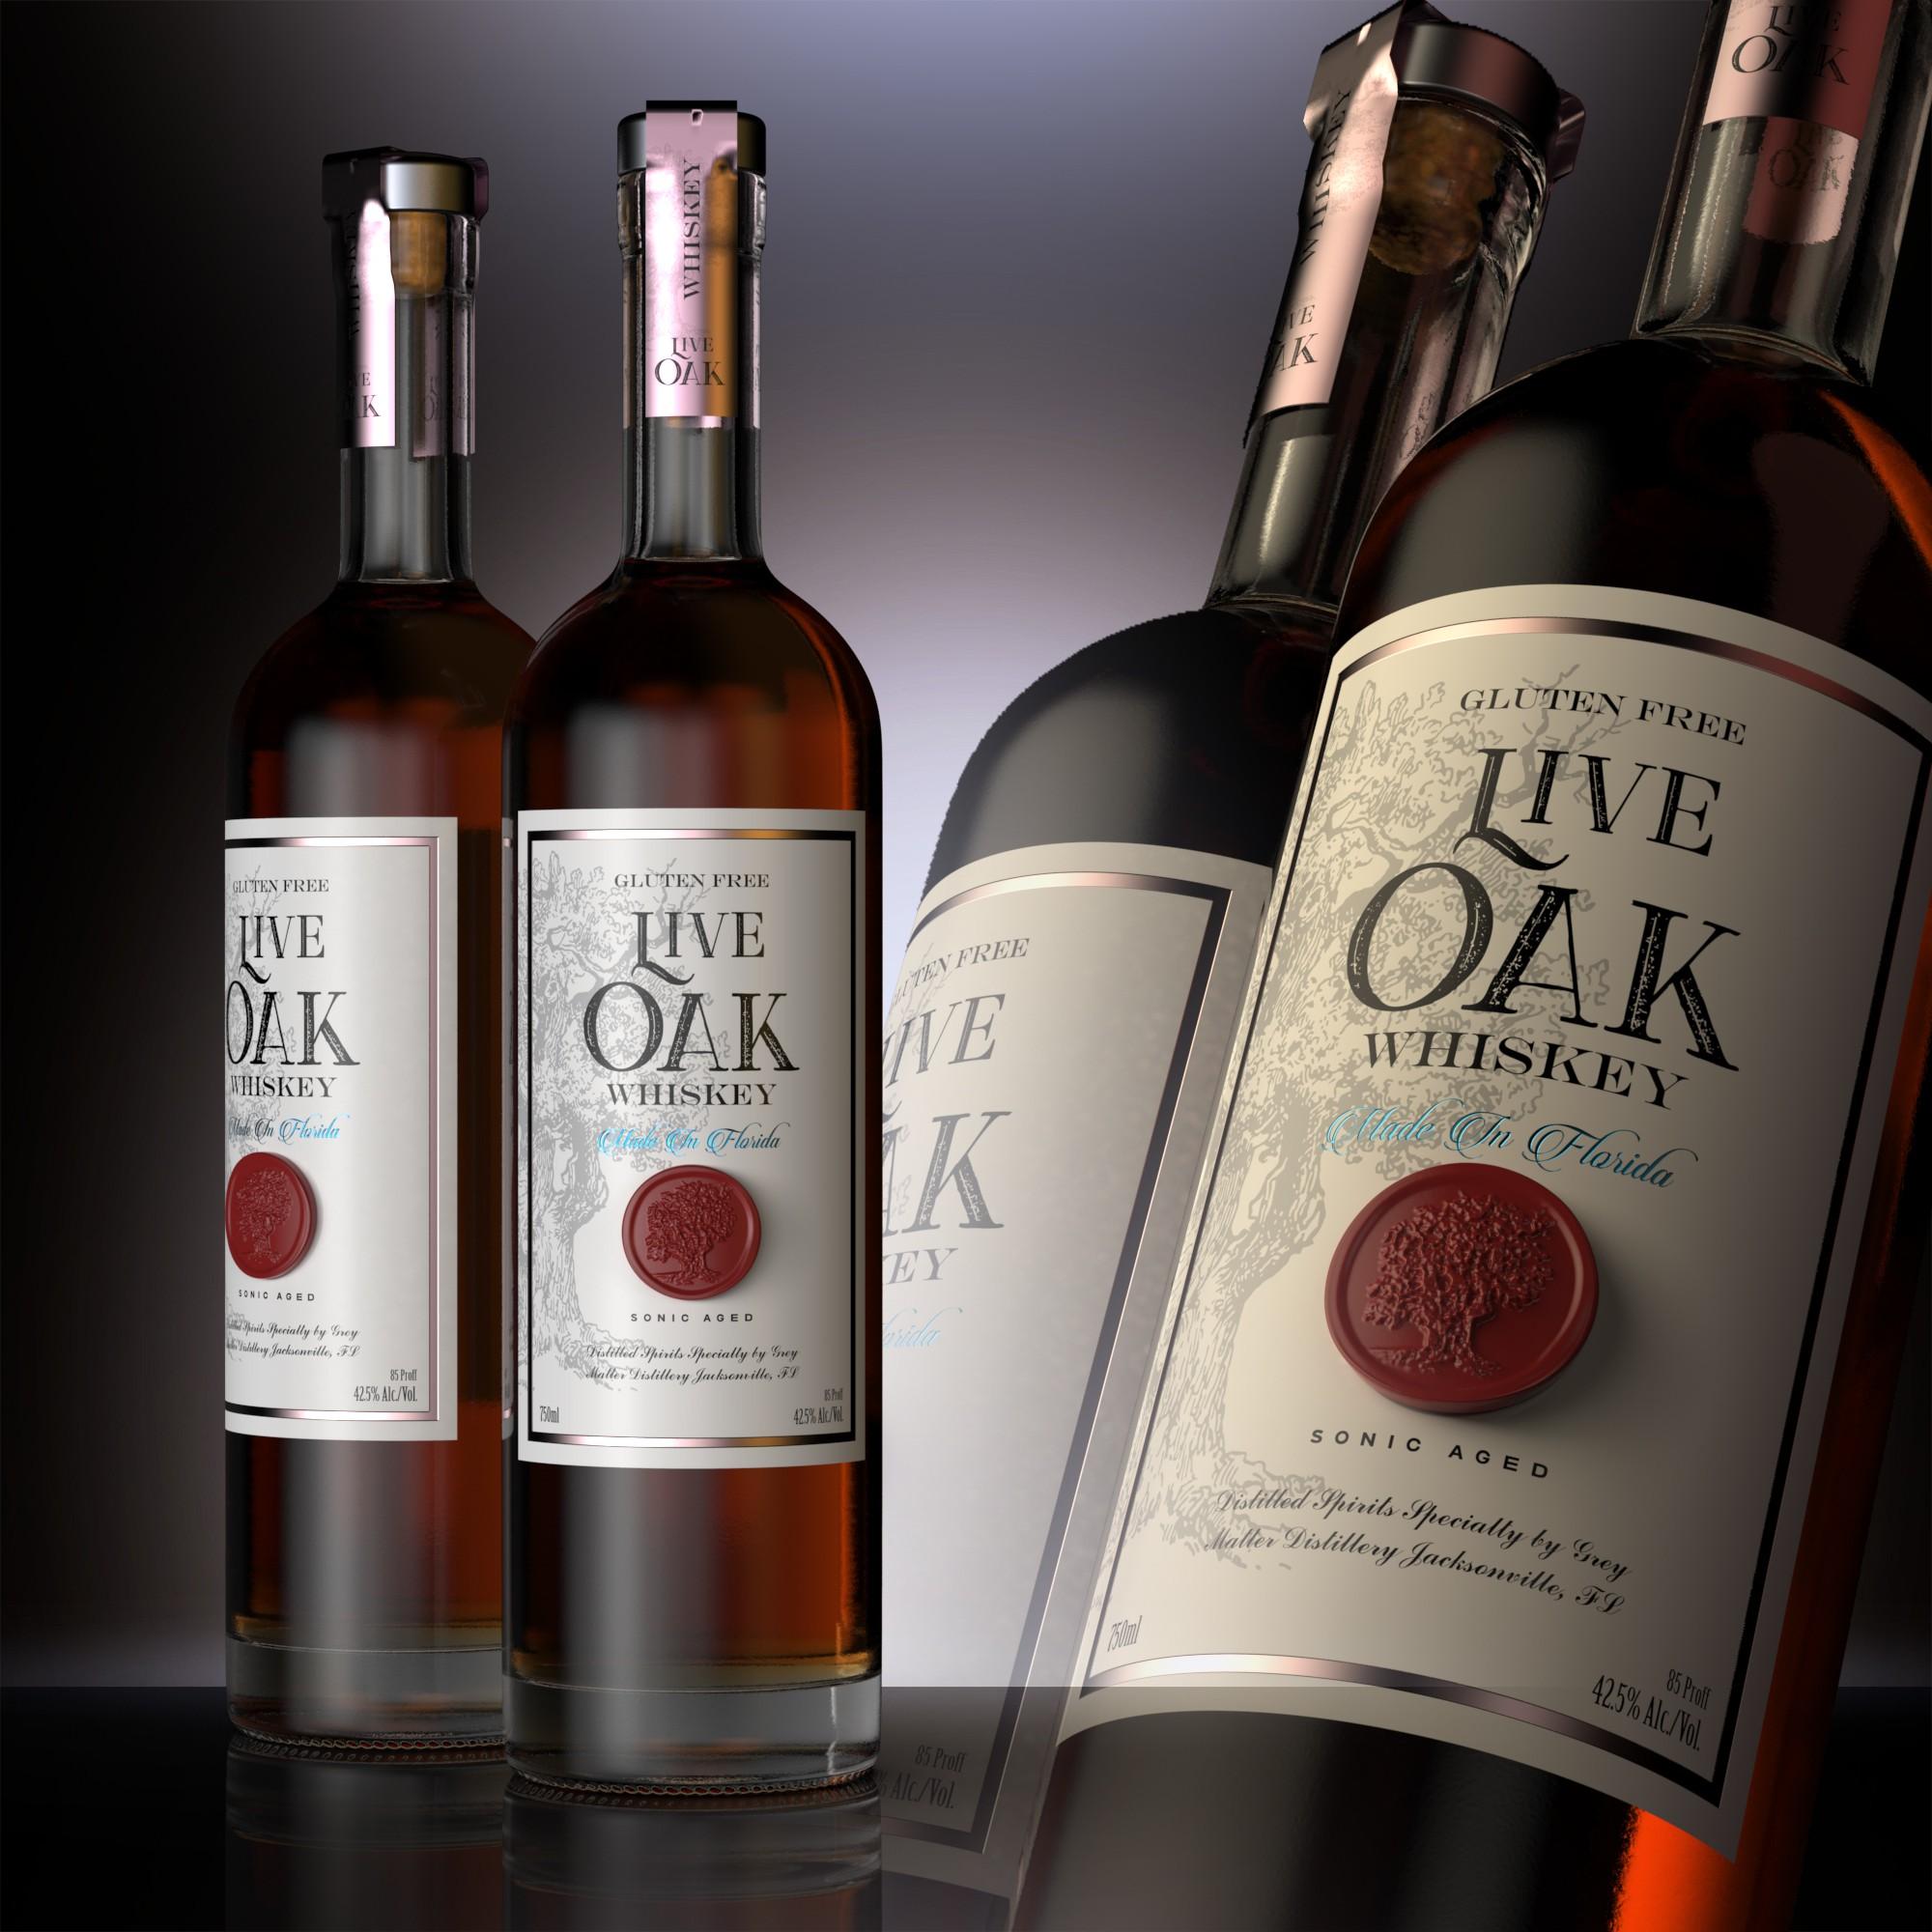 Live Oak Florida Whiskey